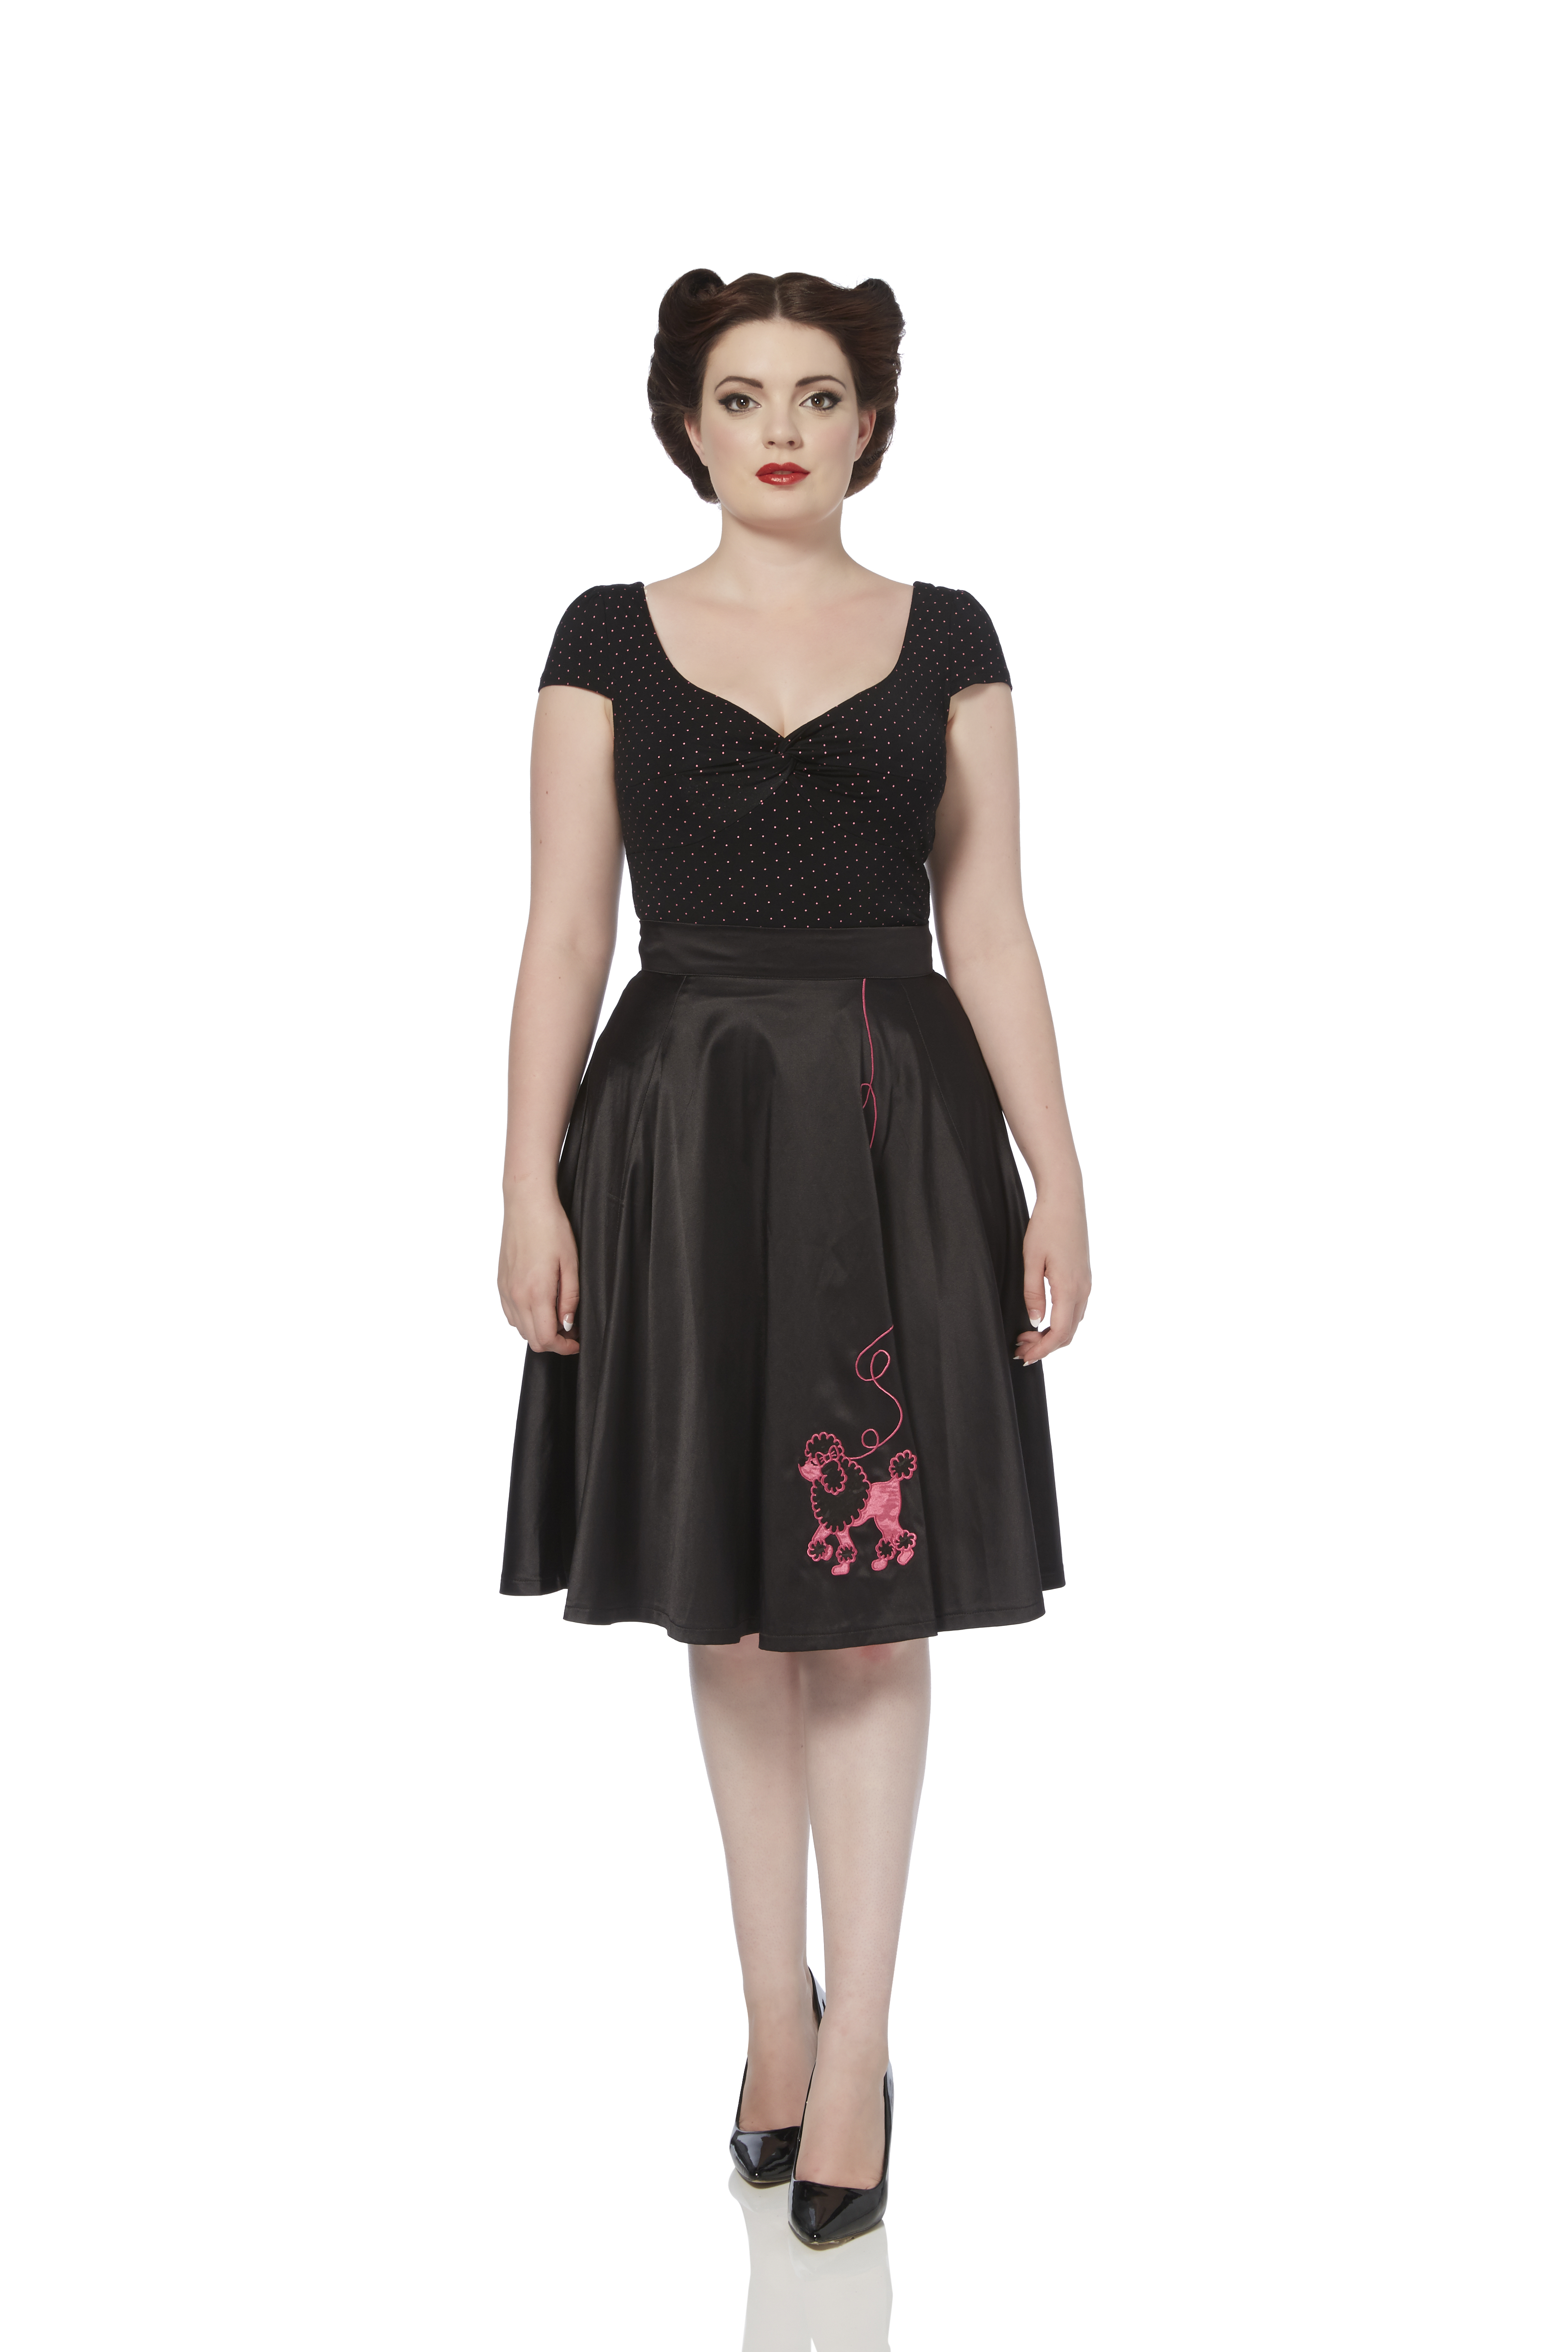 voodoo_vixen_sandy_rockabilly_pink_poodle_skirt_skirts_2.jpg